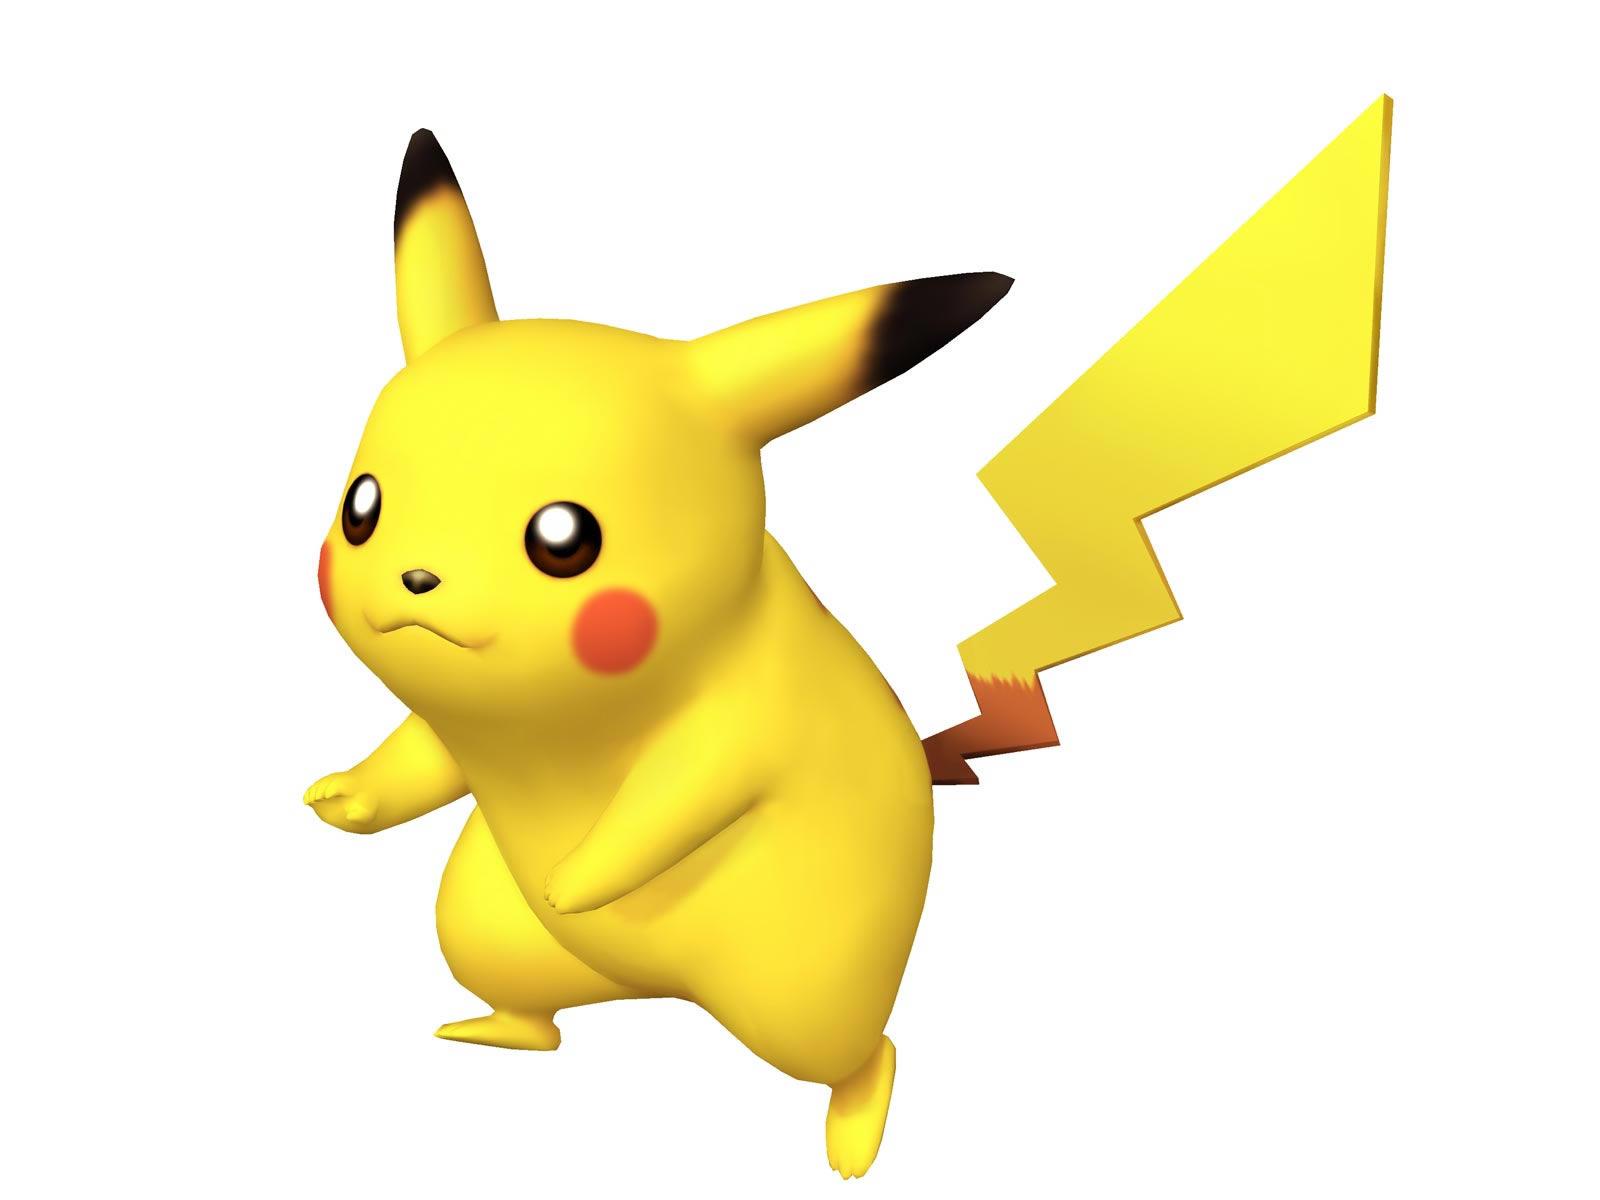 3D Pikachu